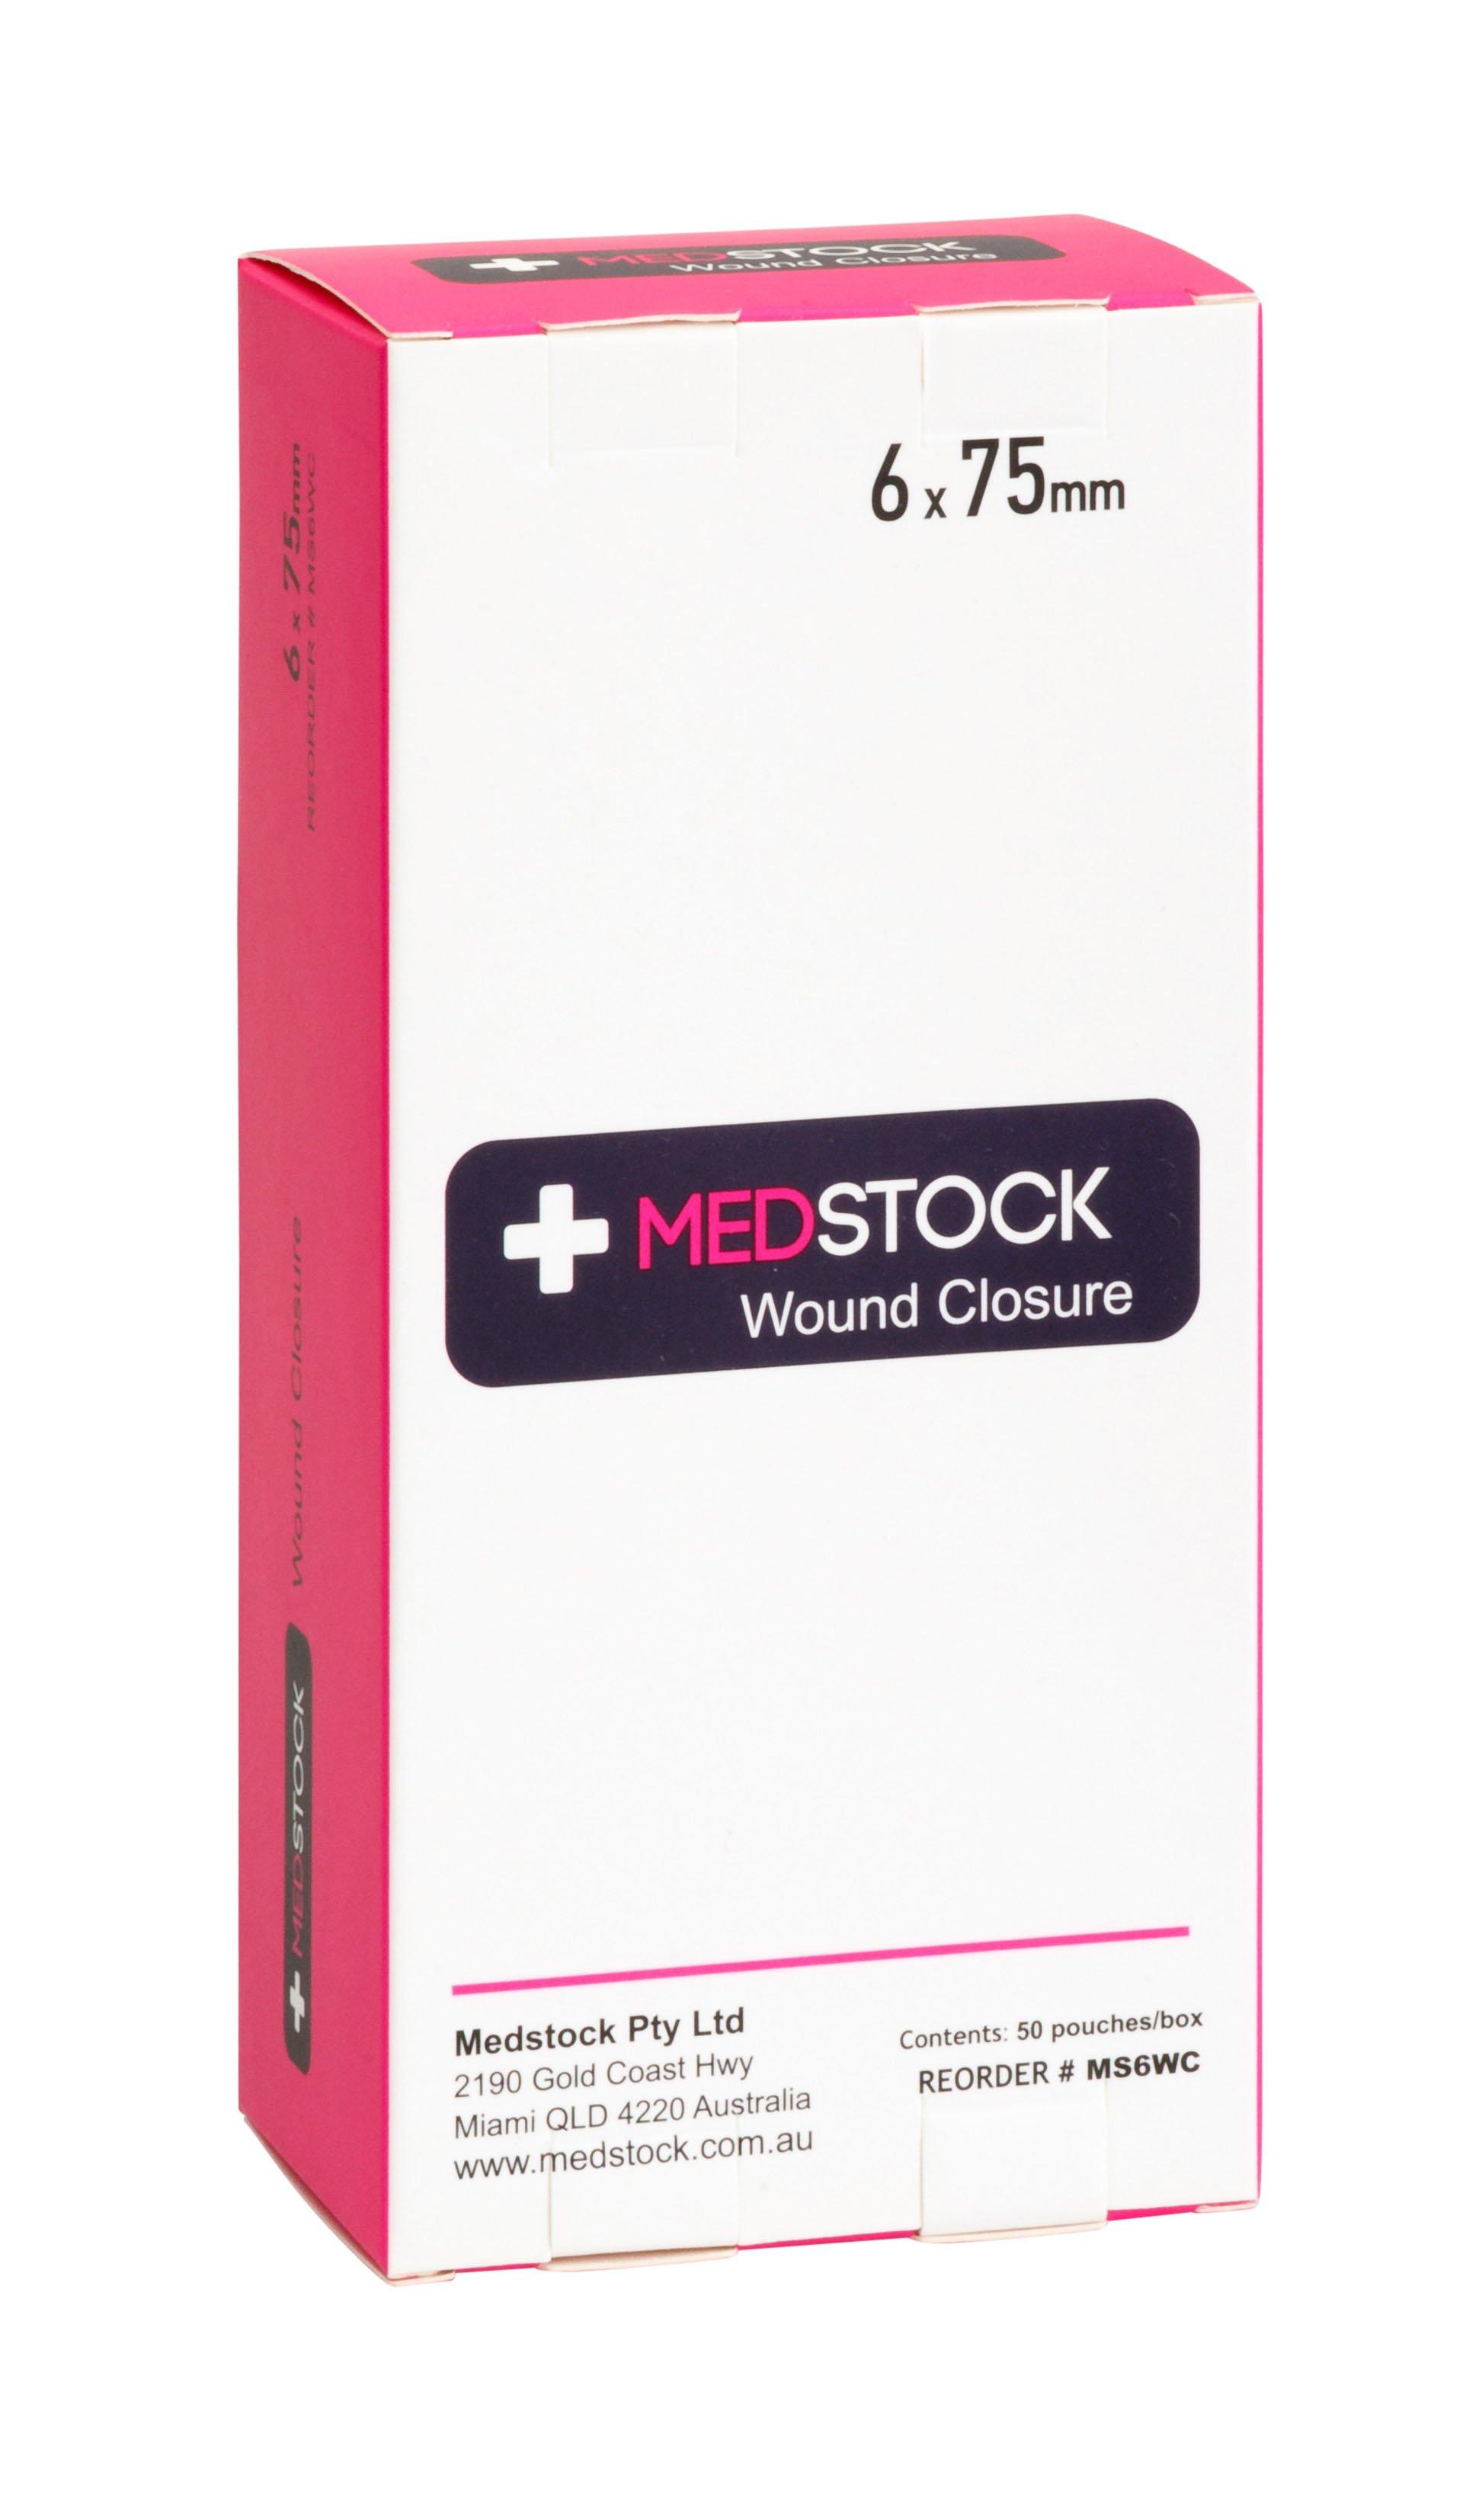 MEDSTOCK WOUND CLOSURE STRIP 6MMx75MM, BOX 50